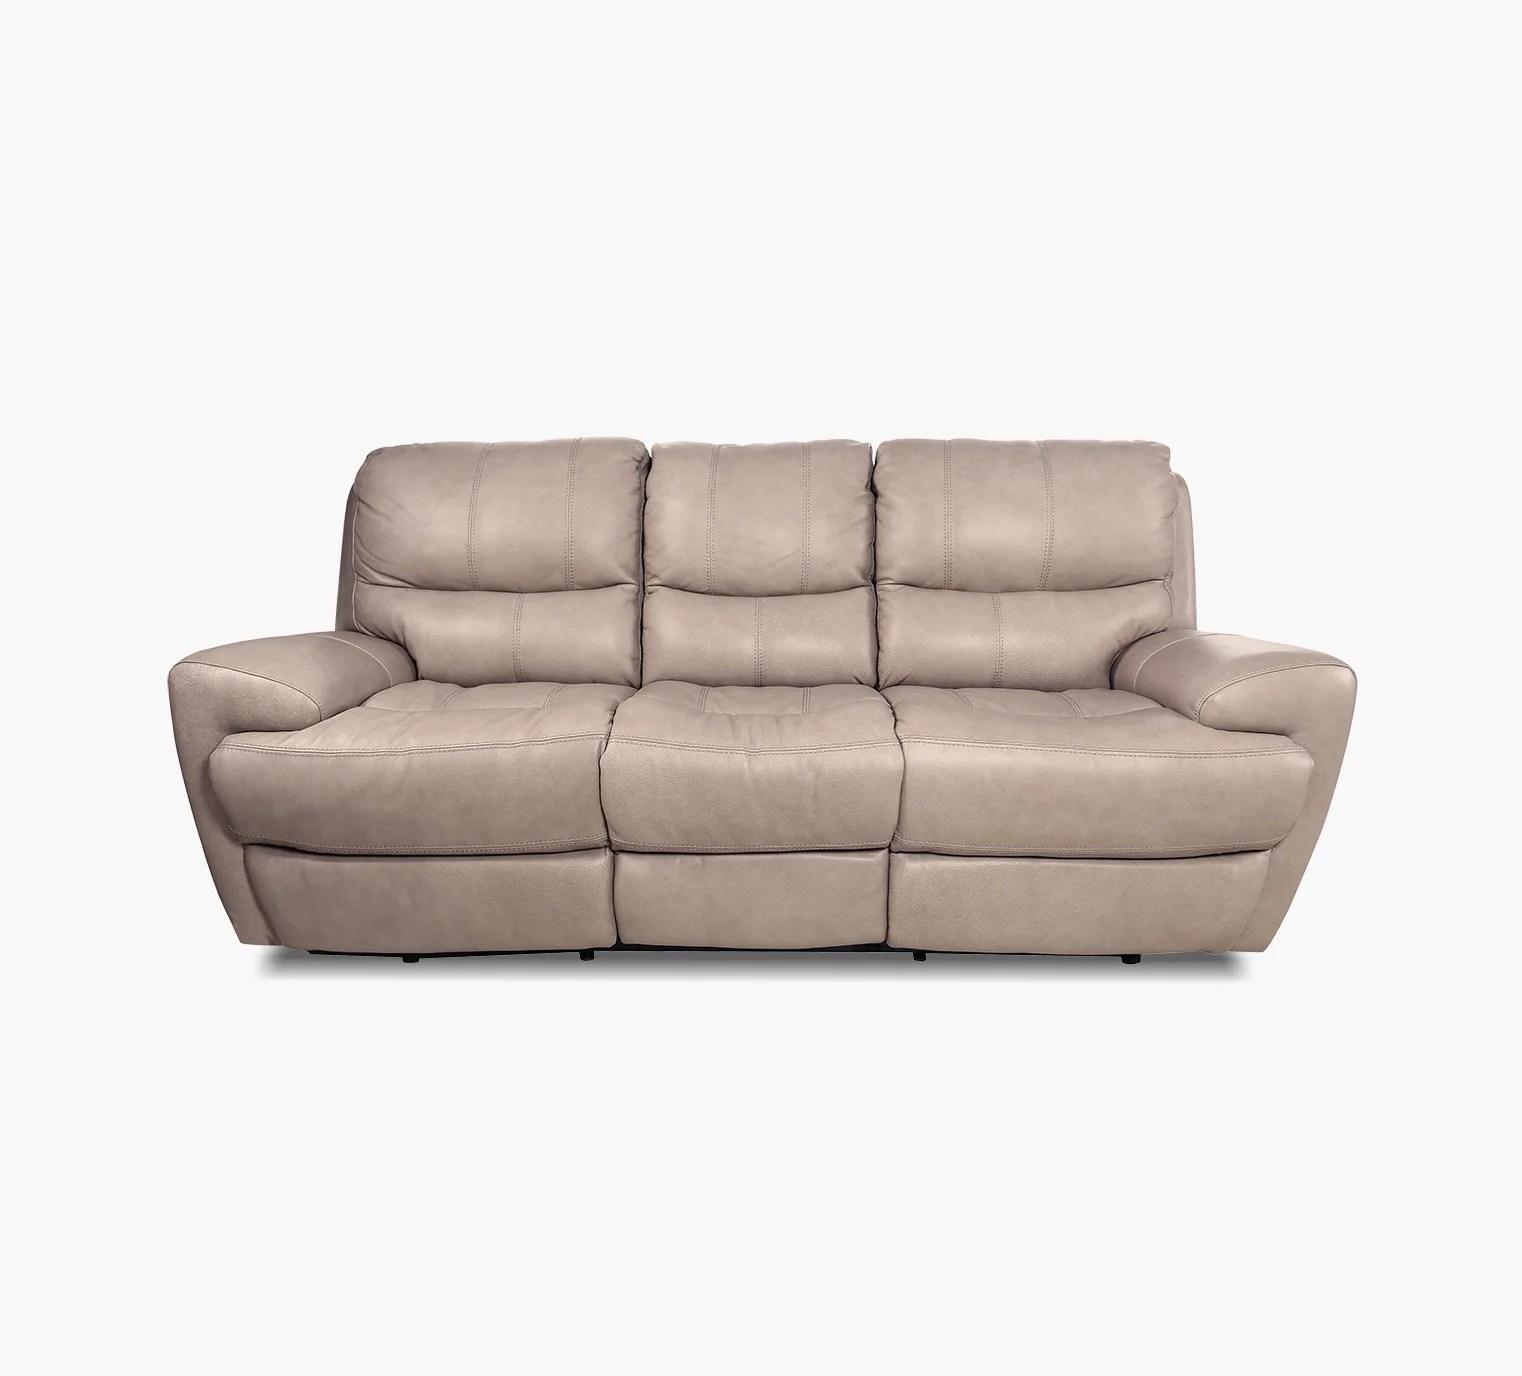 Iris Pebble Leather Power Reclining Sofa With Power Headrest